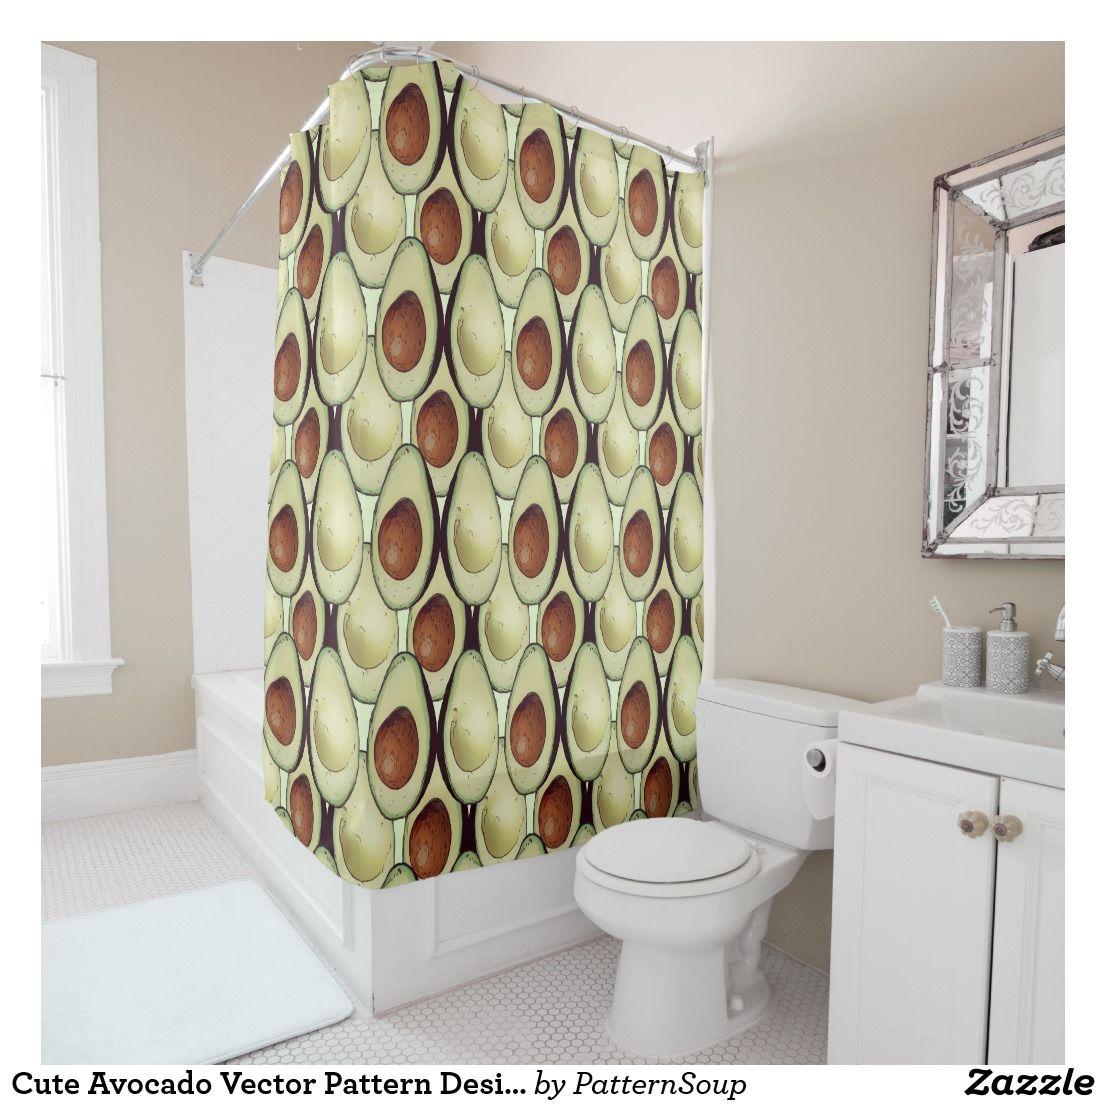 Cute Avocado Vector Pattern Design Shower Curtain Zazzle Ca